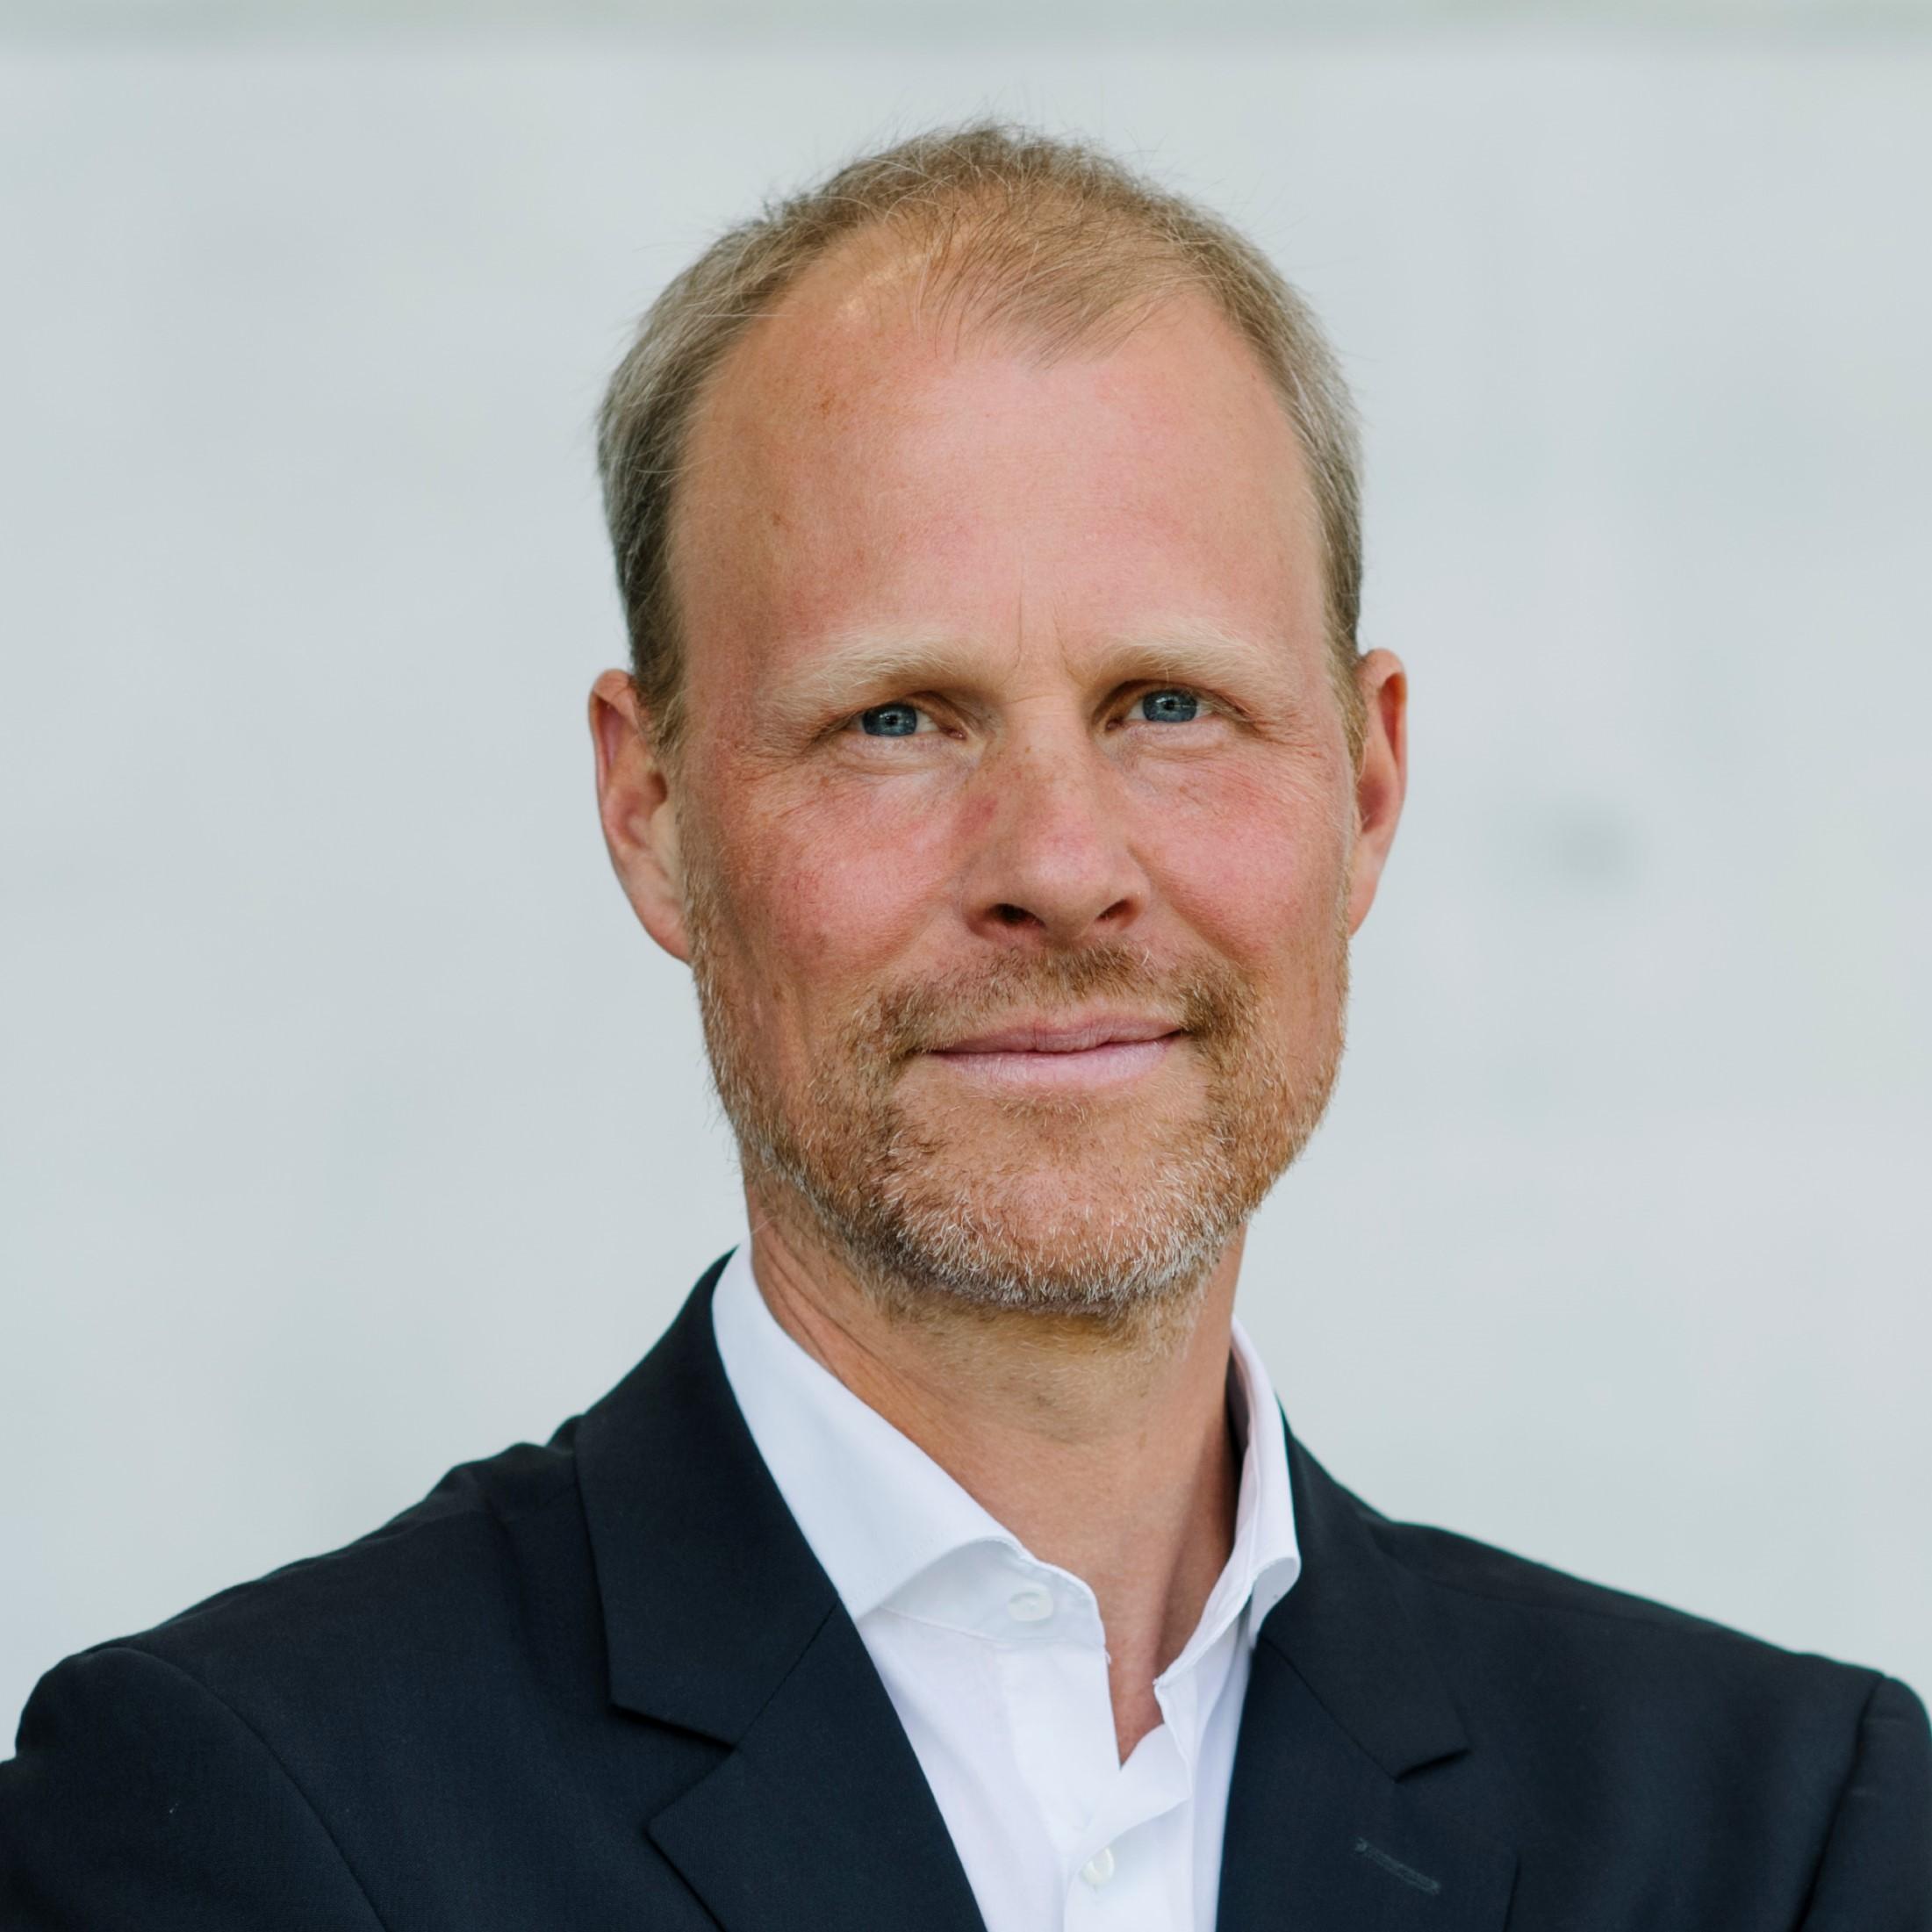 Tobias Fuhrmann